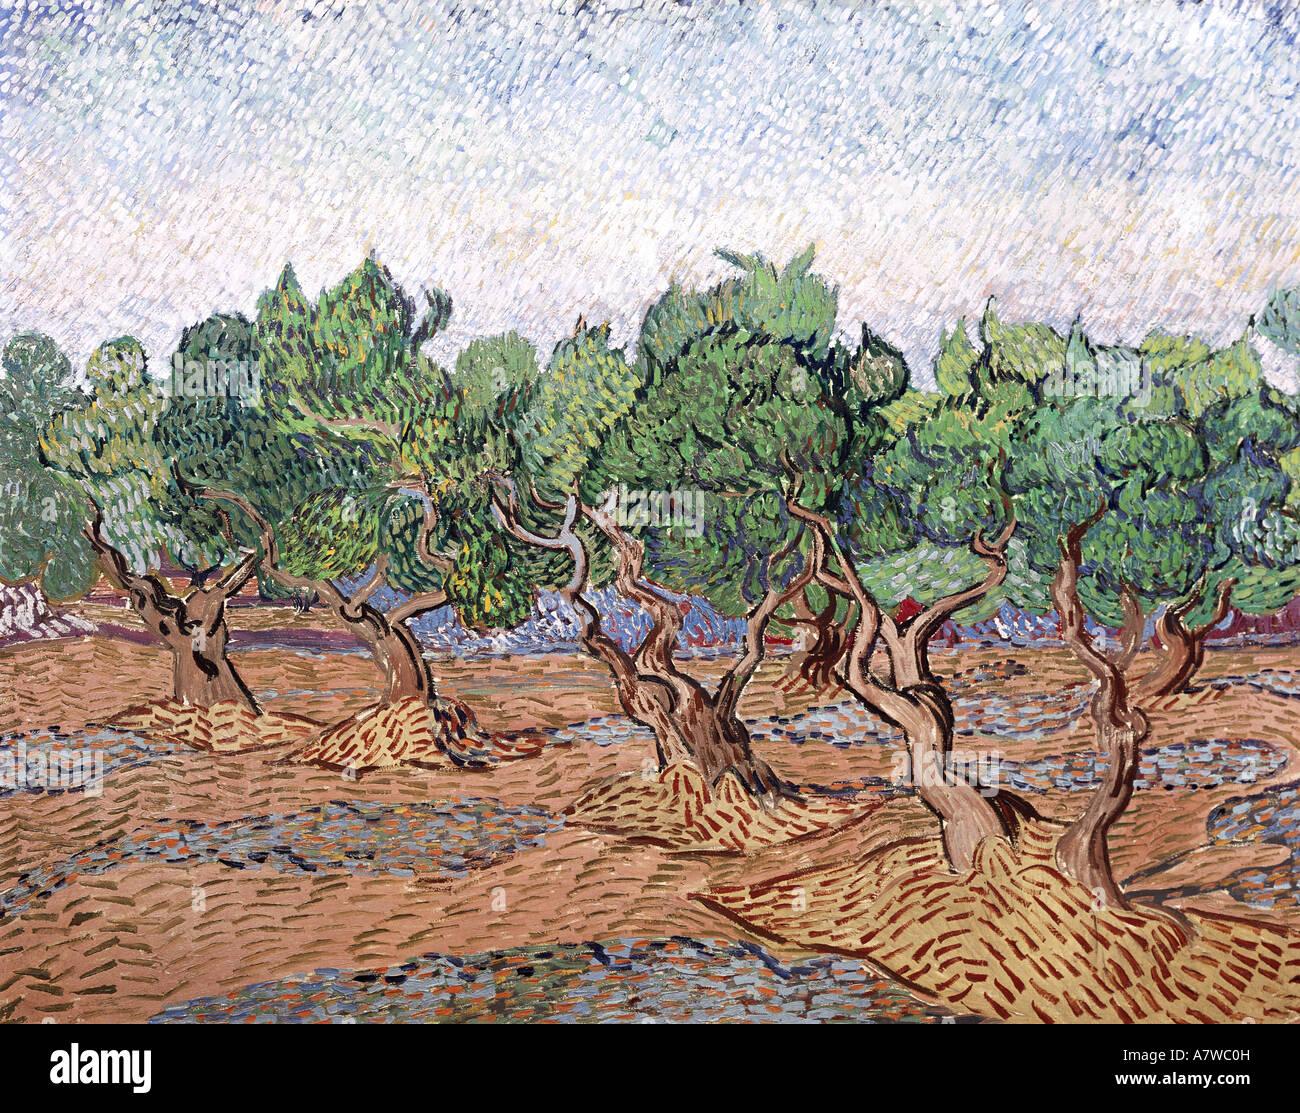 Belle arti, Gogh, Vincent van (1853 - 1890), olivi, rosa sky, pittura, Saint Remy 1889, olio su tela, 730 x 925 Immagini Stock